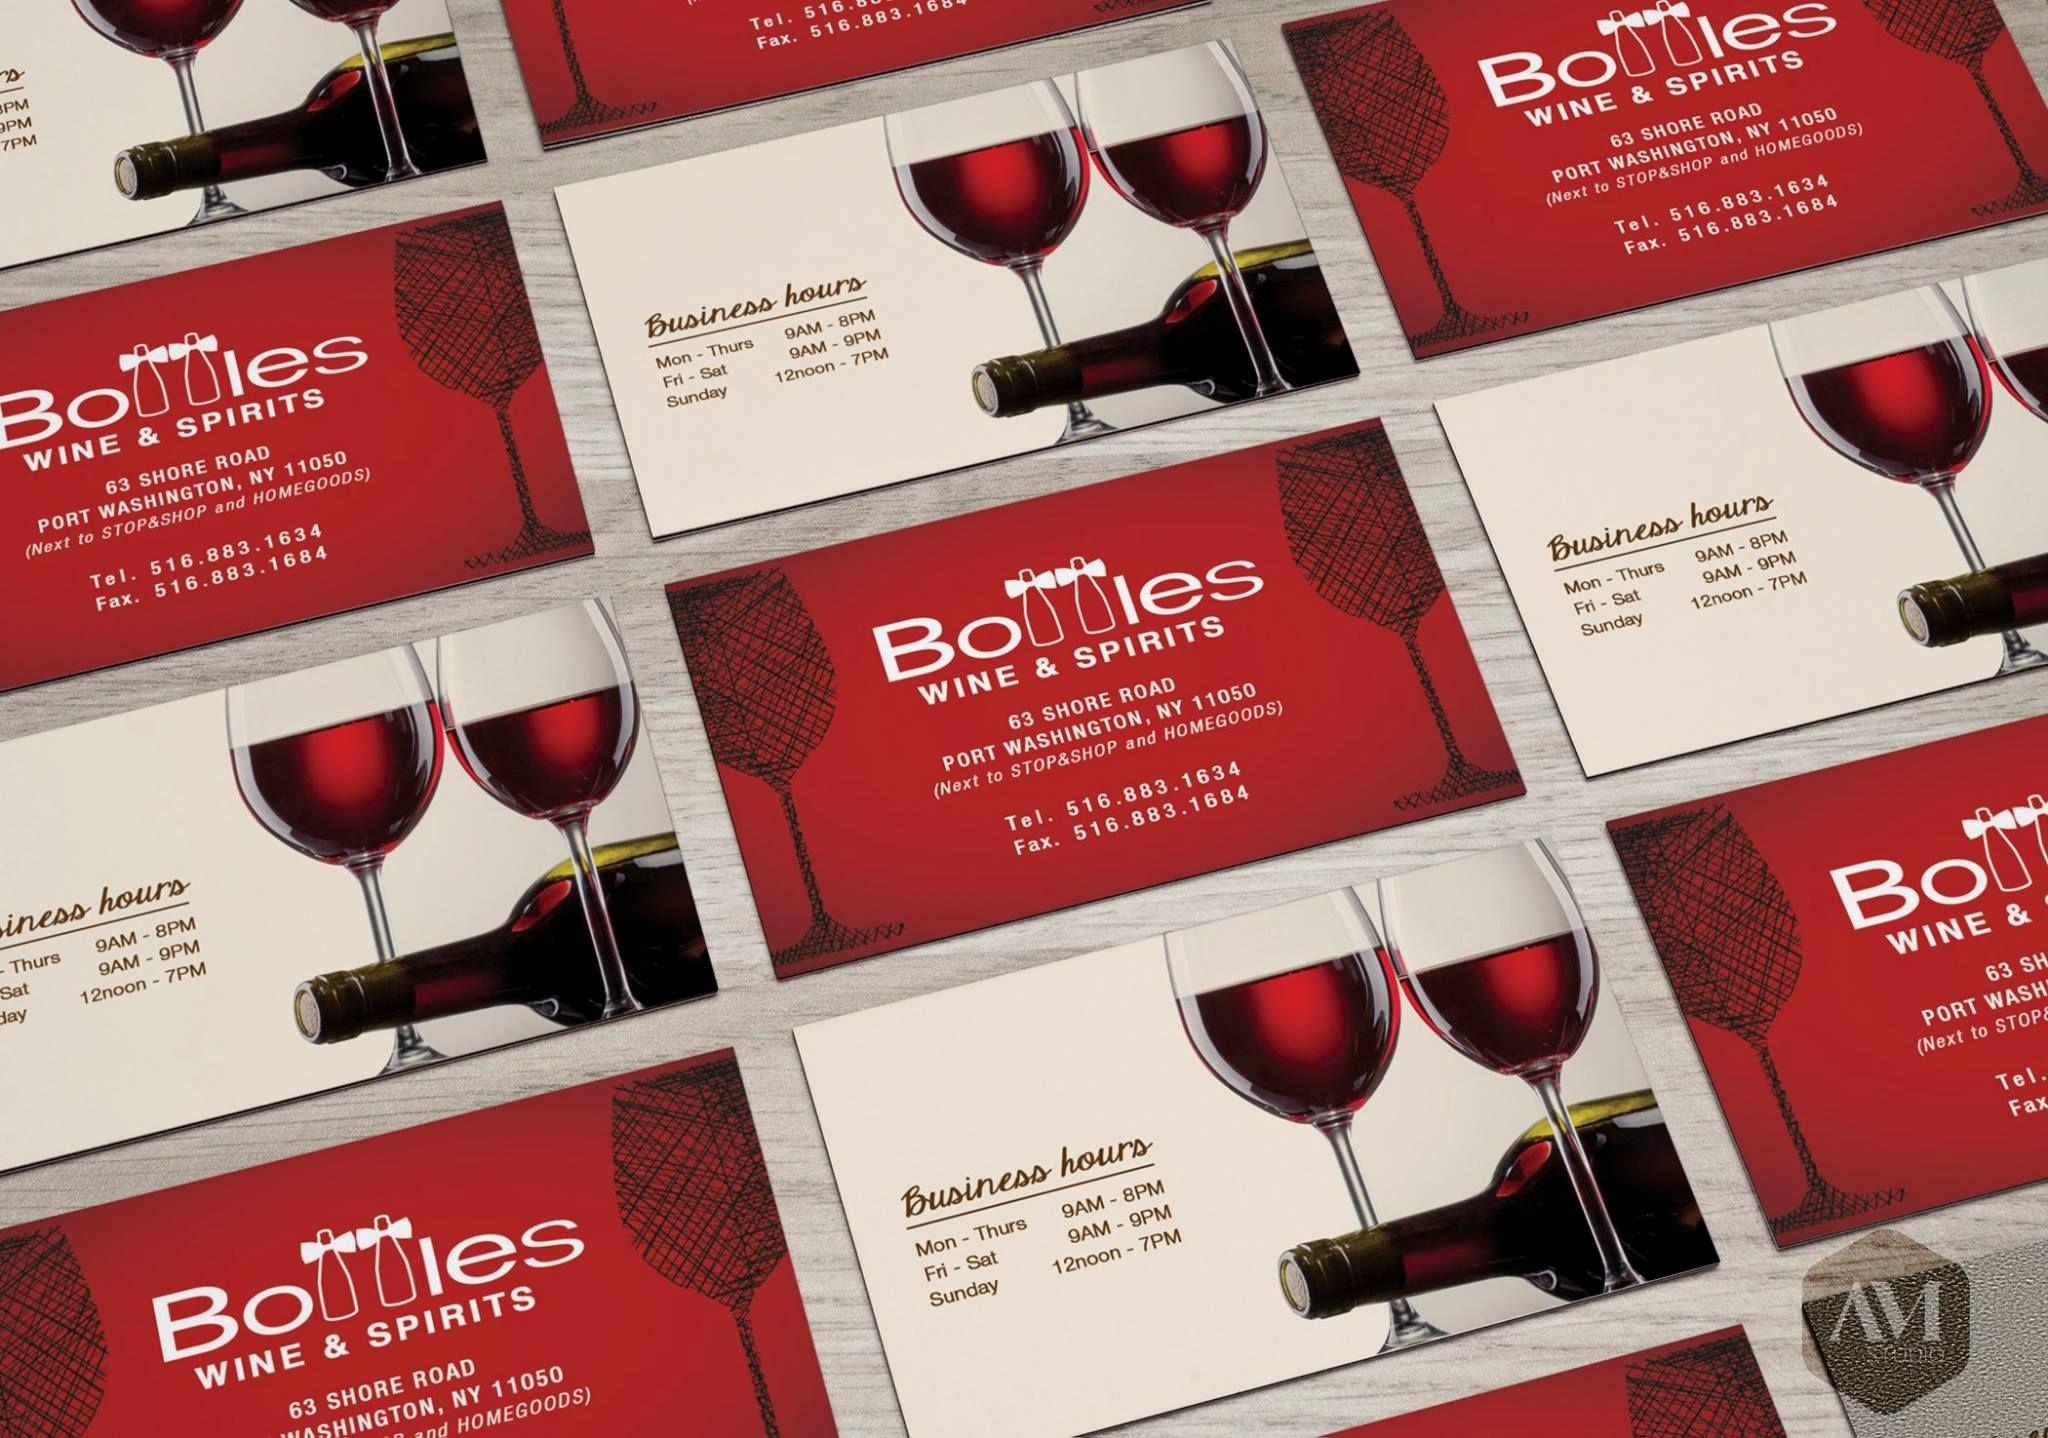 Bottle Wine Spirits Winery Business Card Design Design Amstudio Amdesign Wine And Spirits Wine Bottle Business Card Design